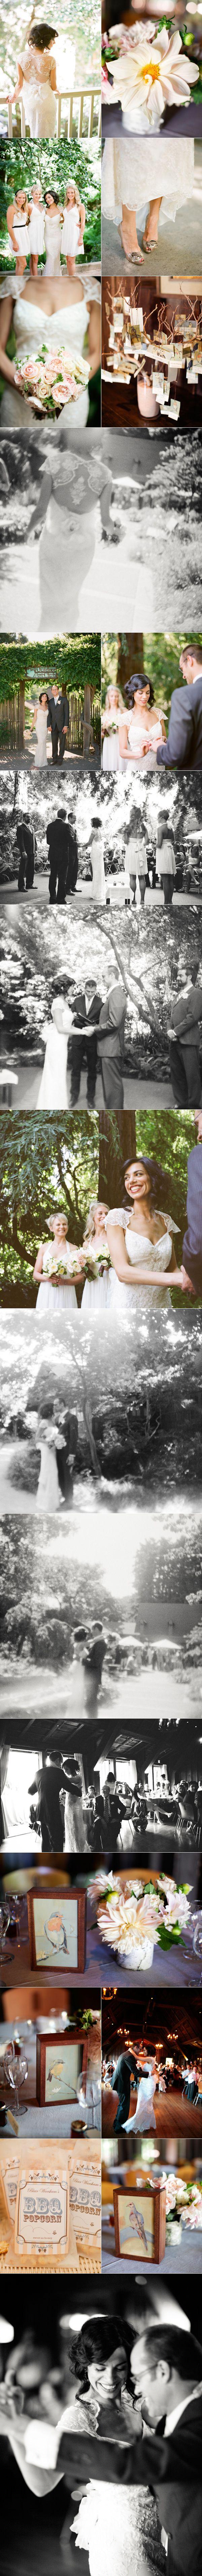 RUSTIC WEDDING- ONCE WED